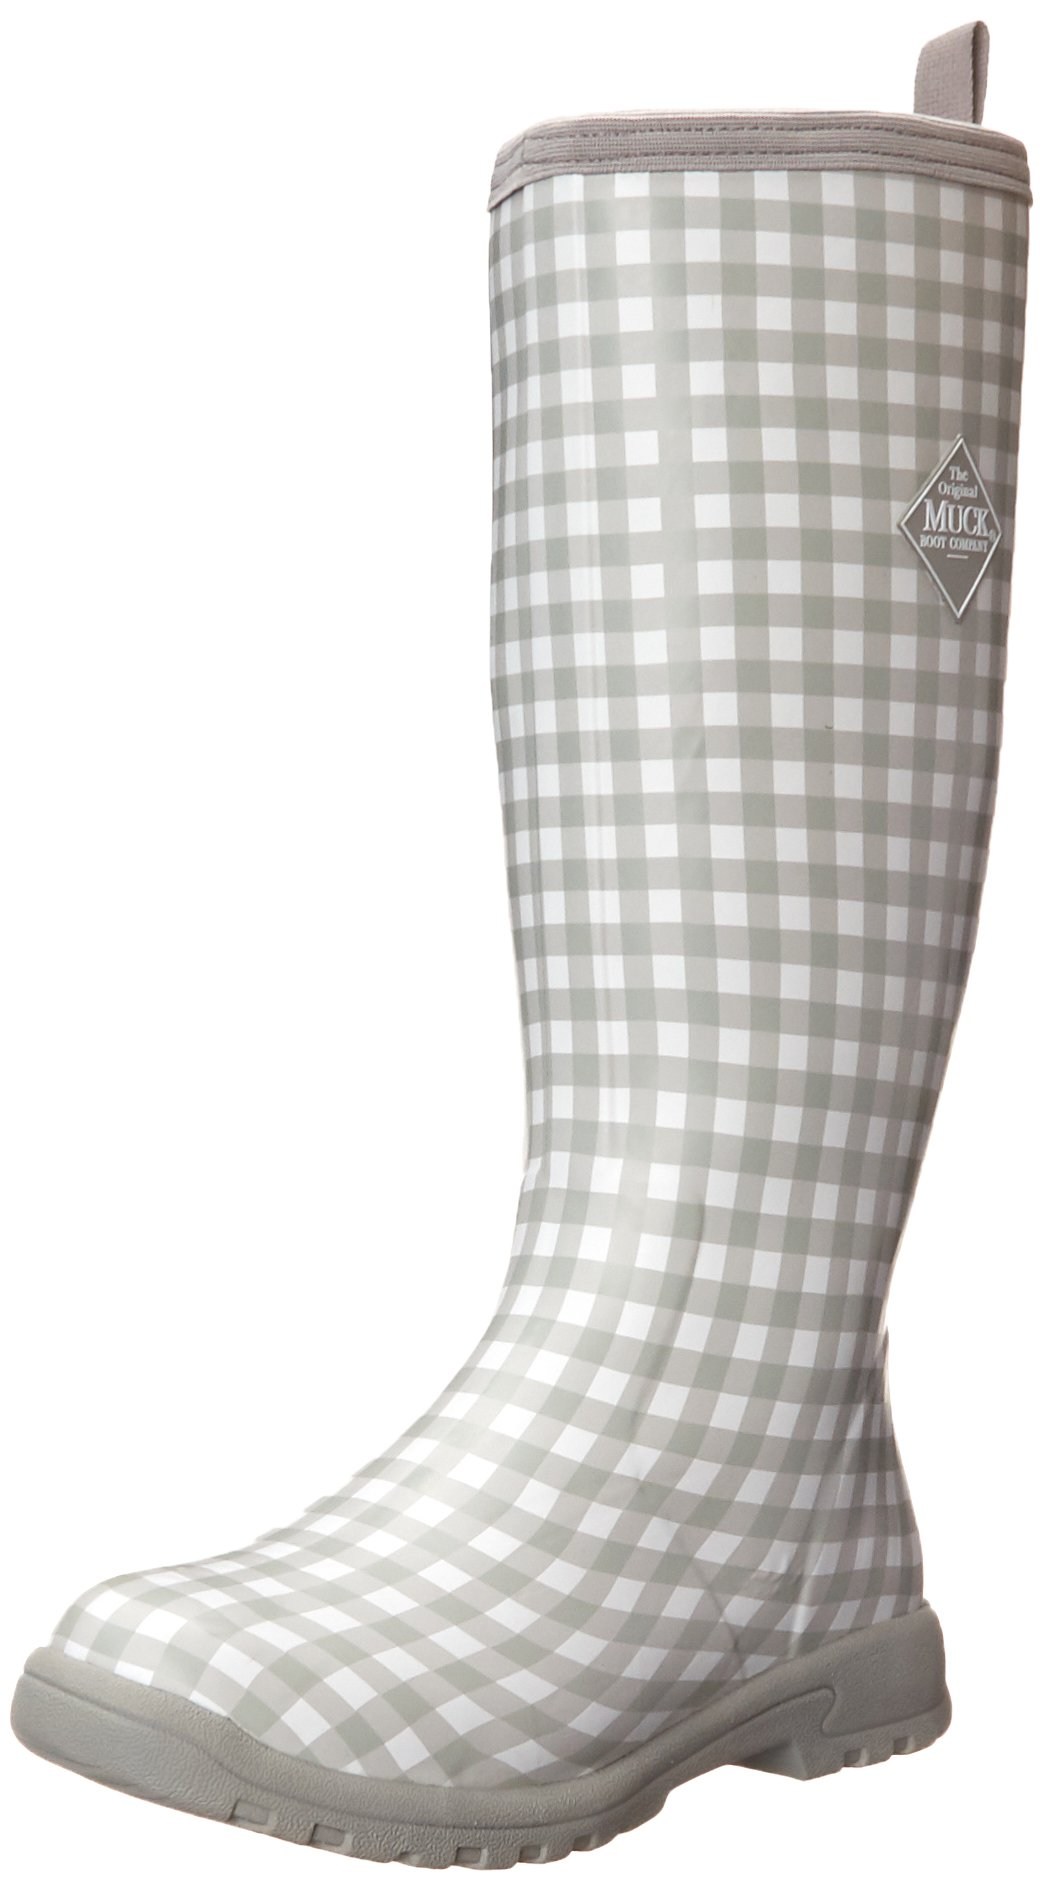 MuckBoots Women's Breezy Tall Insulated Rain Boot, Gray Gingham, 11 M US